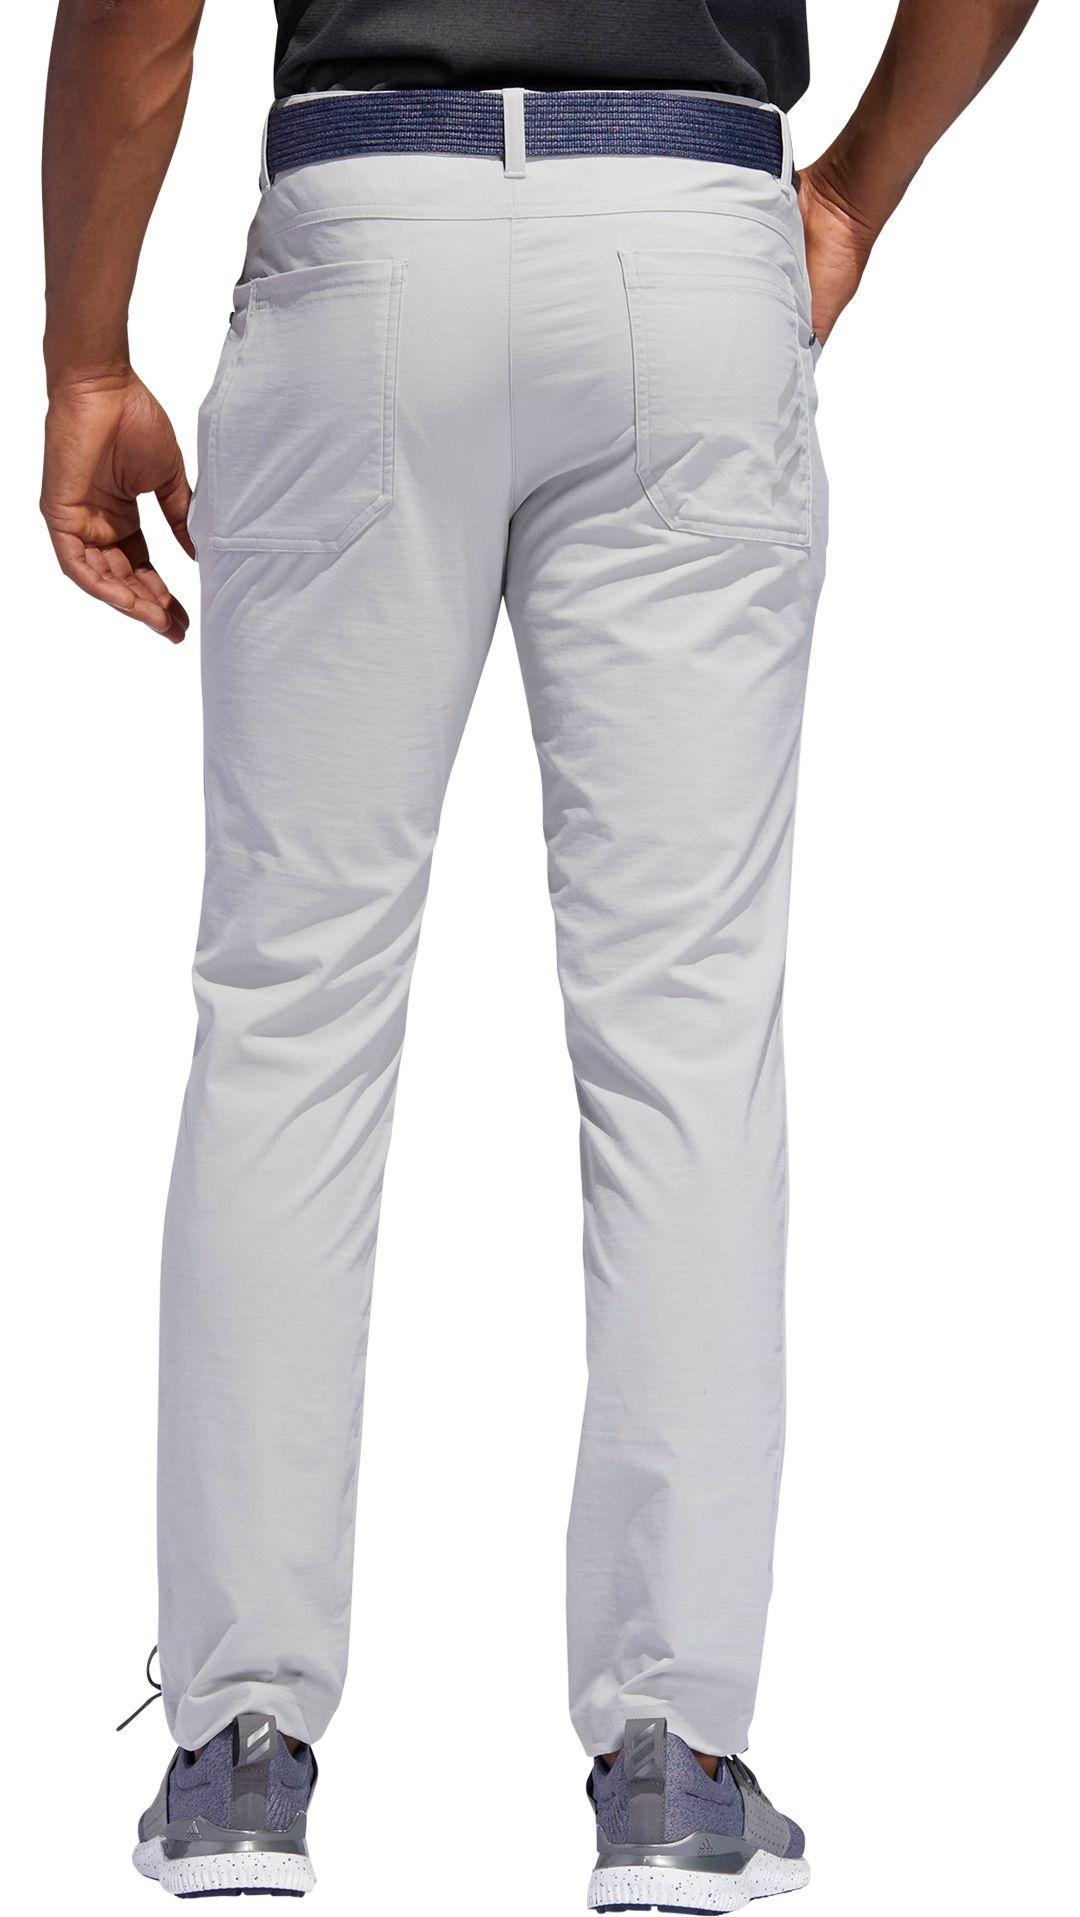 21b72f751778 adidas Men's Adicross Slim 5 Pocket Golf Pants